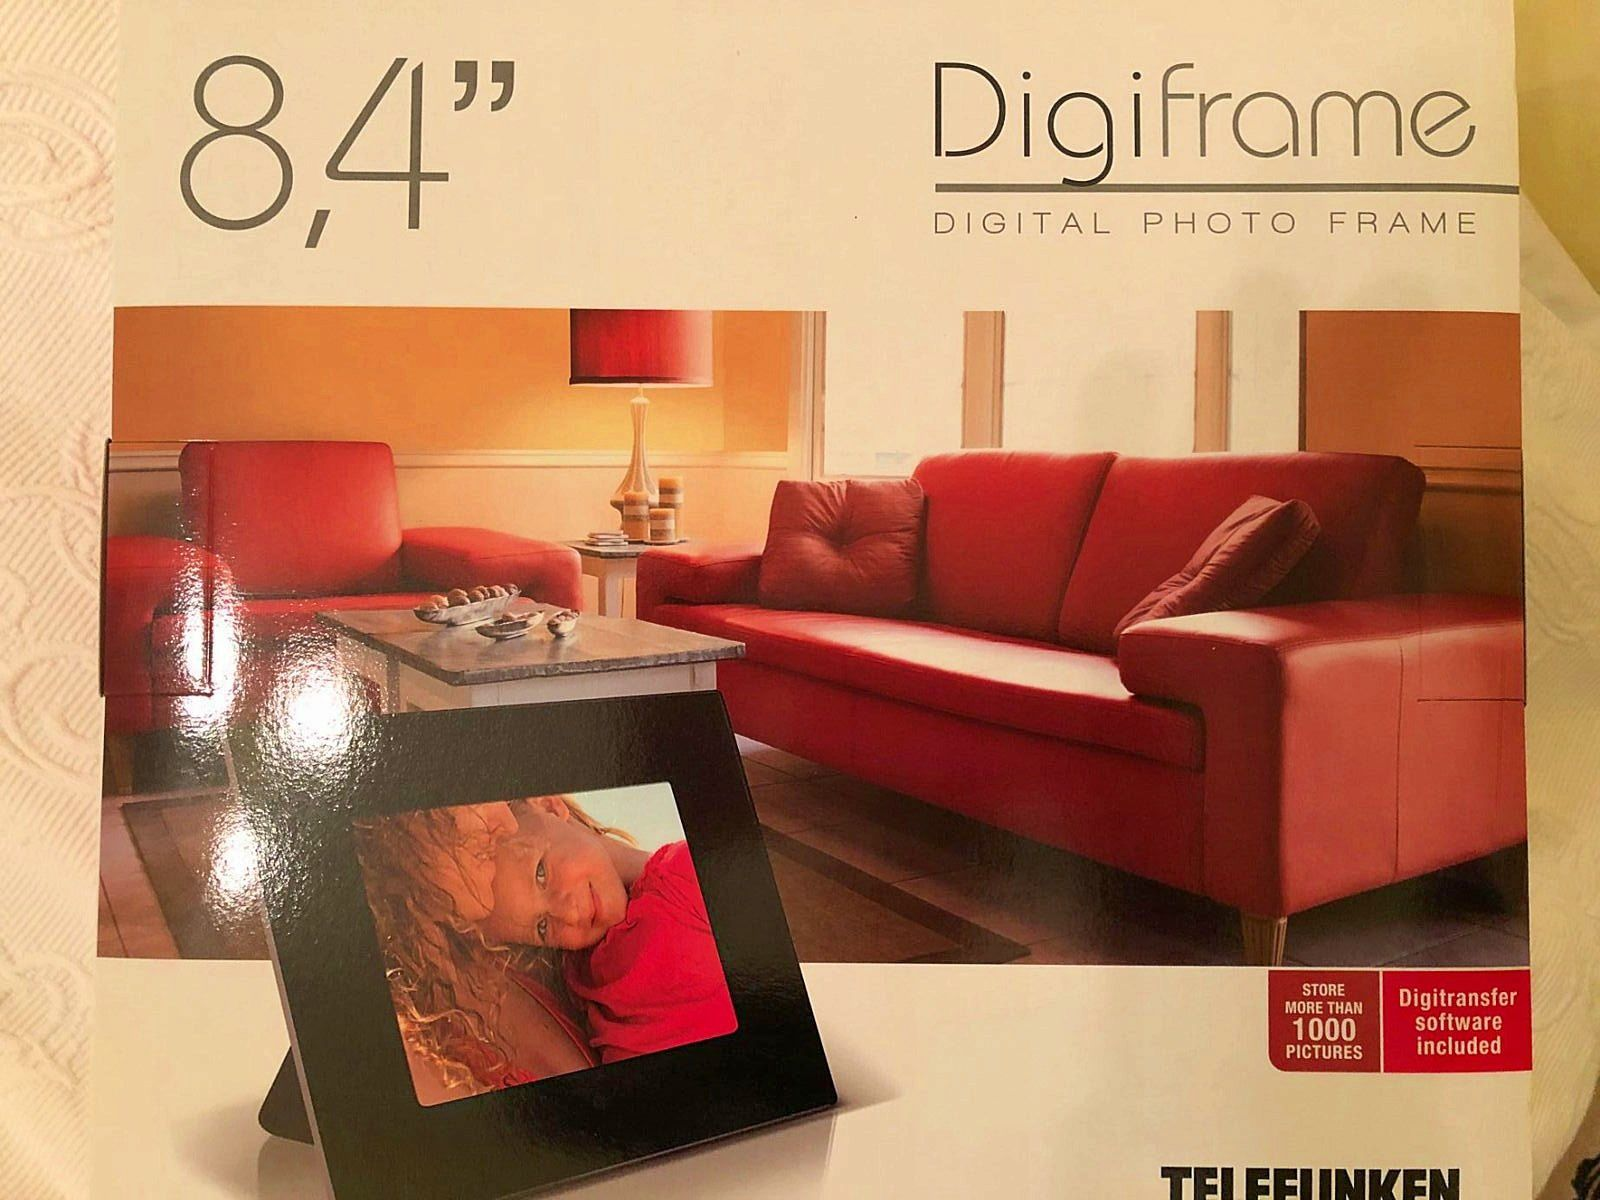 Vends Digicadre DPF8401telefunken